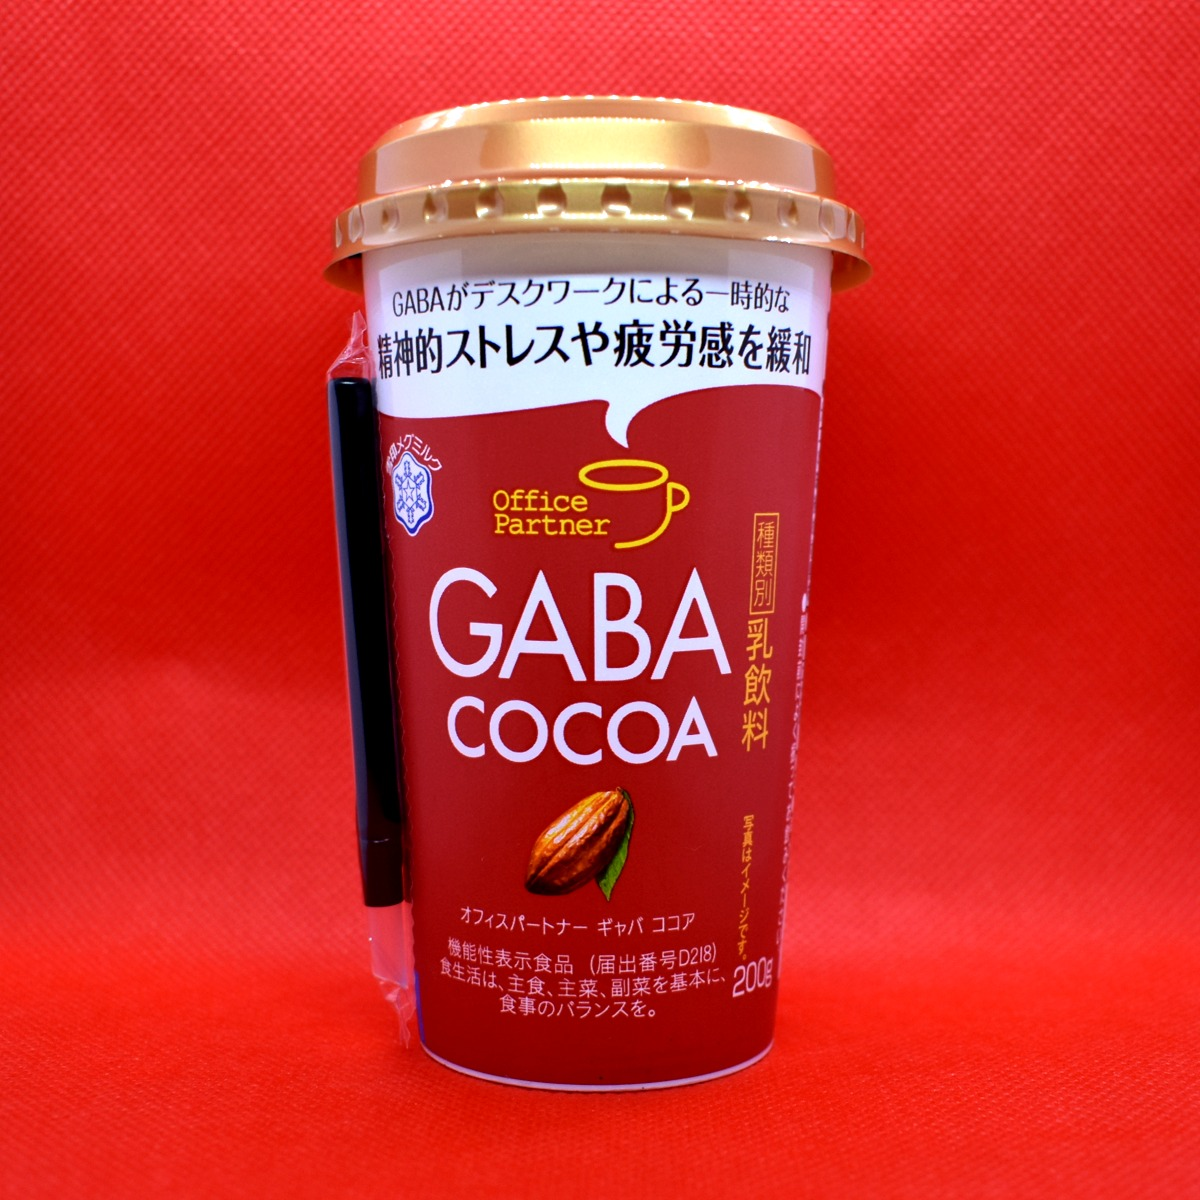 GABA Cocoa Functional Drink Japanese Market